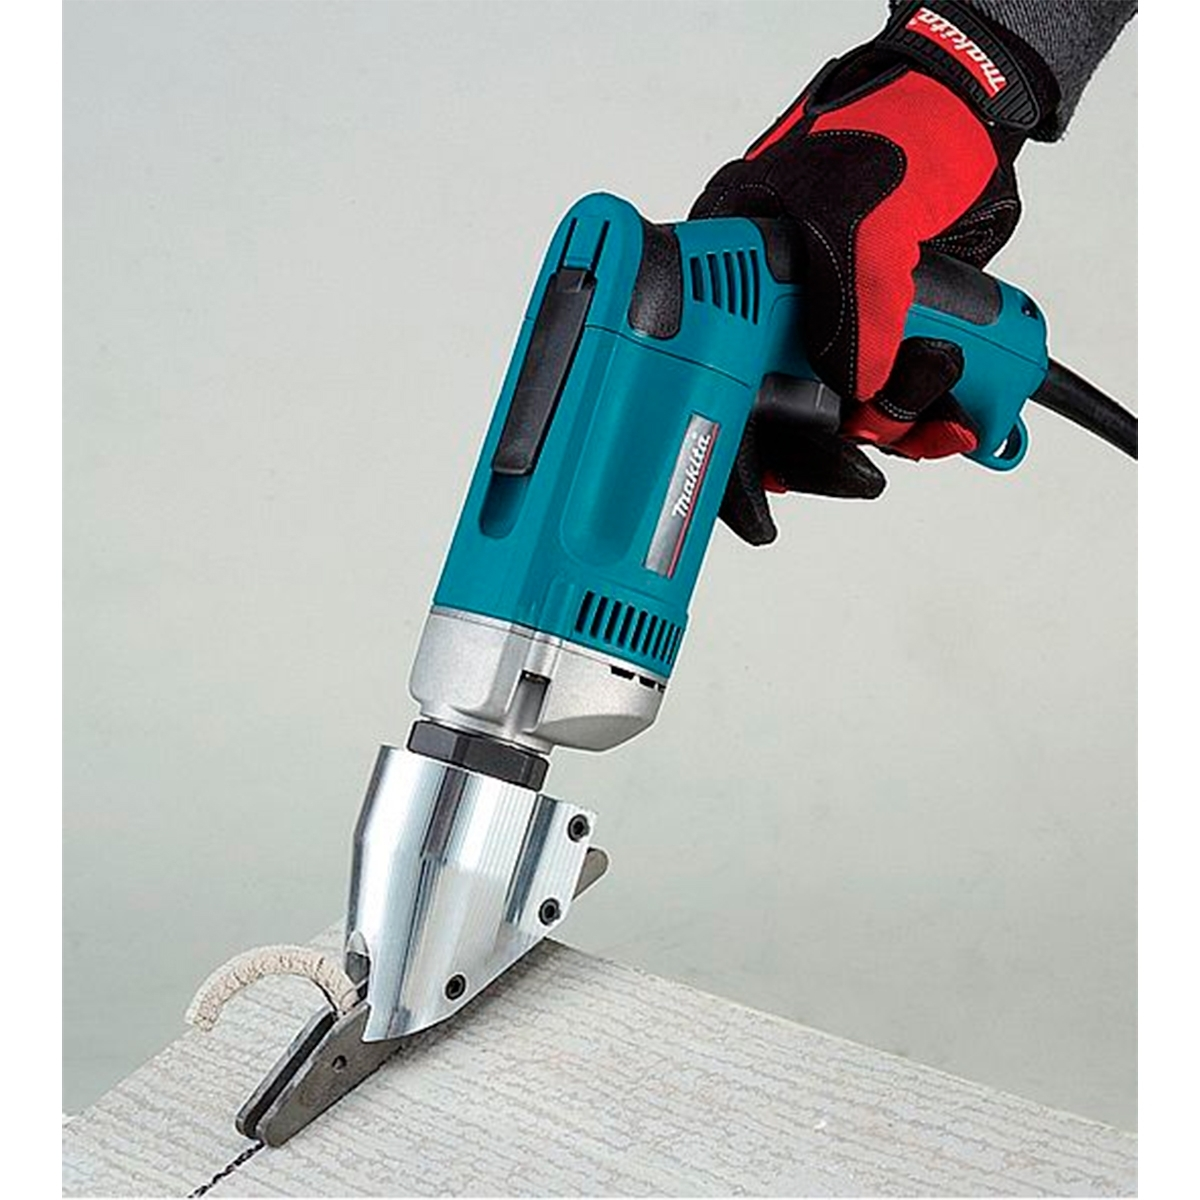 Makita js8000 cizalla 570 w para cortar fibrocemento - Cortar pizarra en casa ...